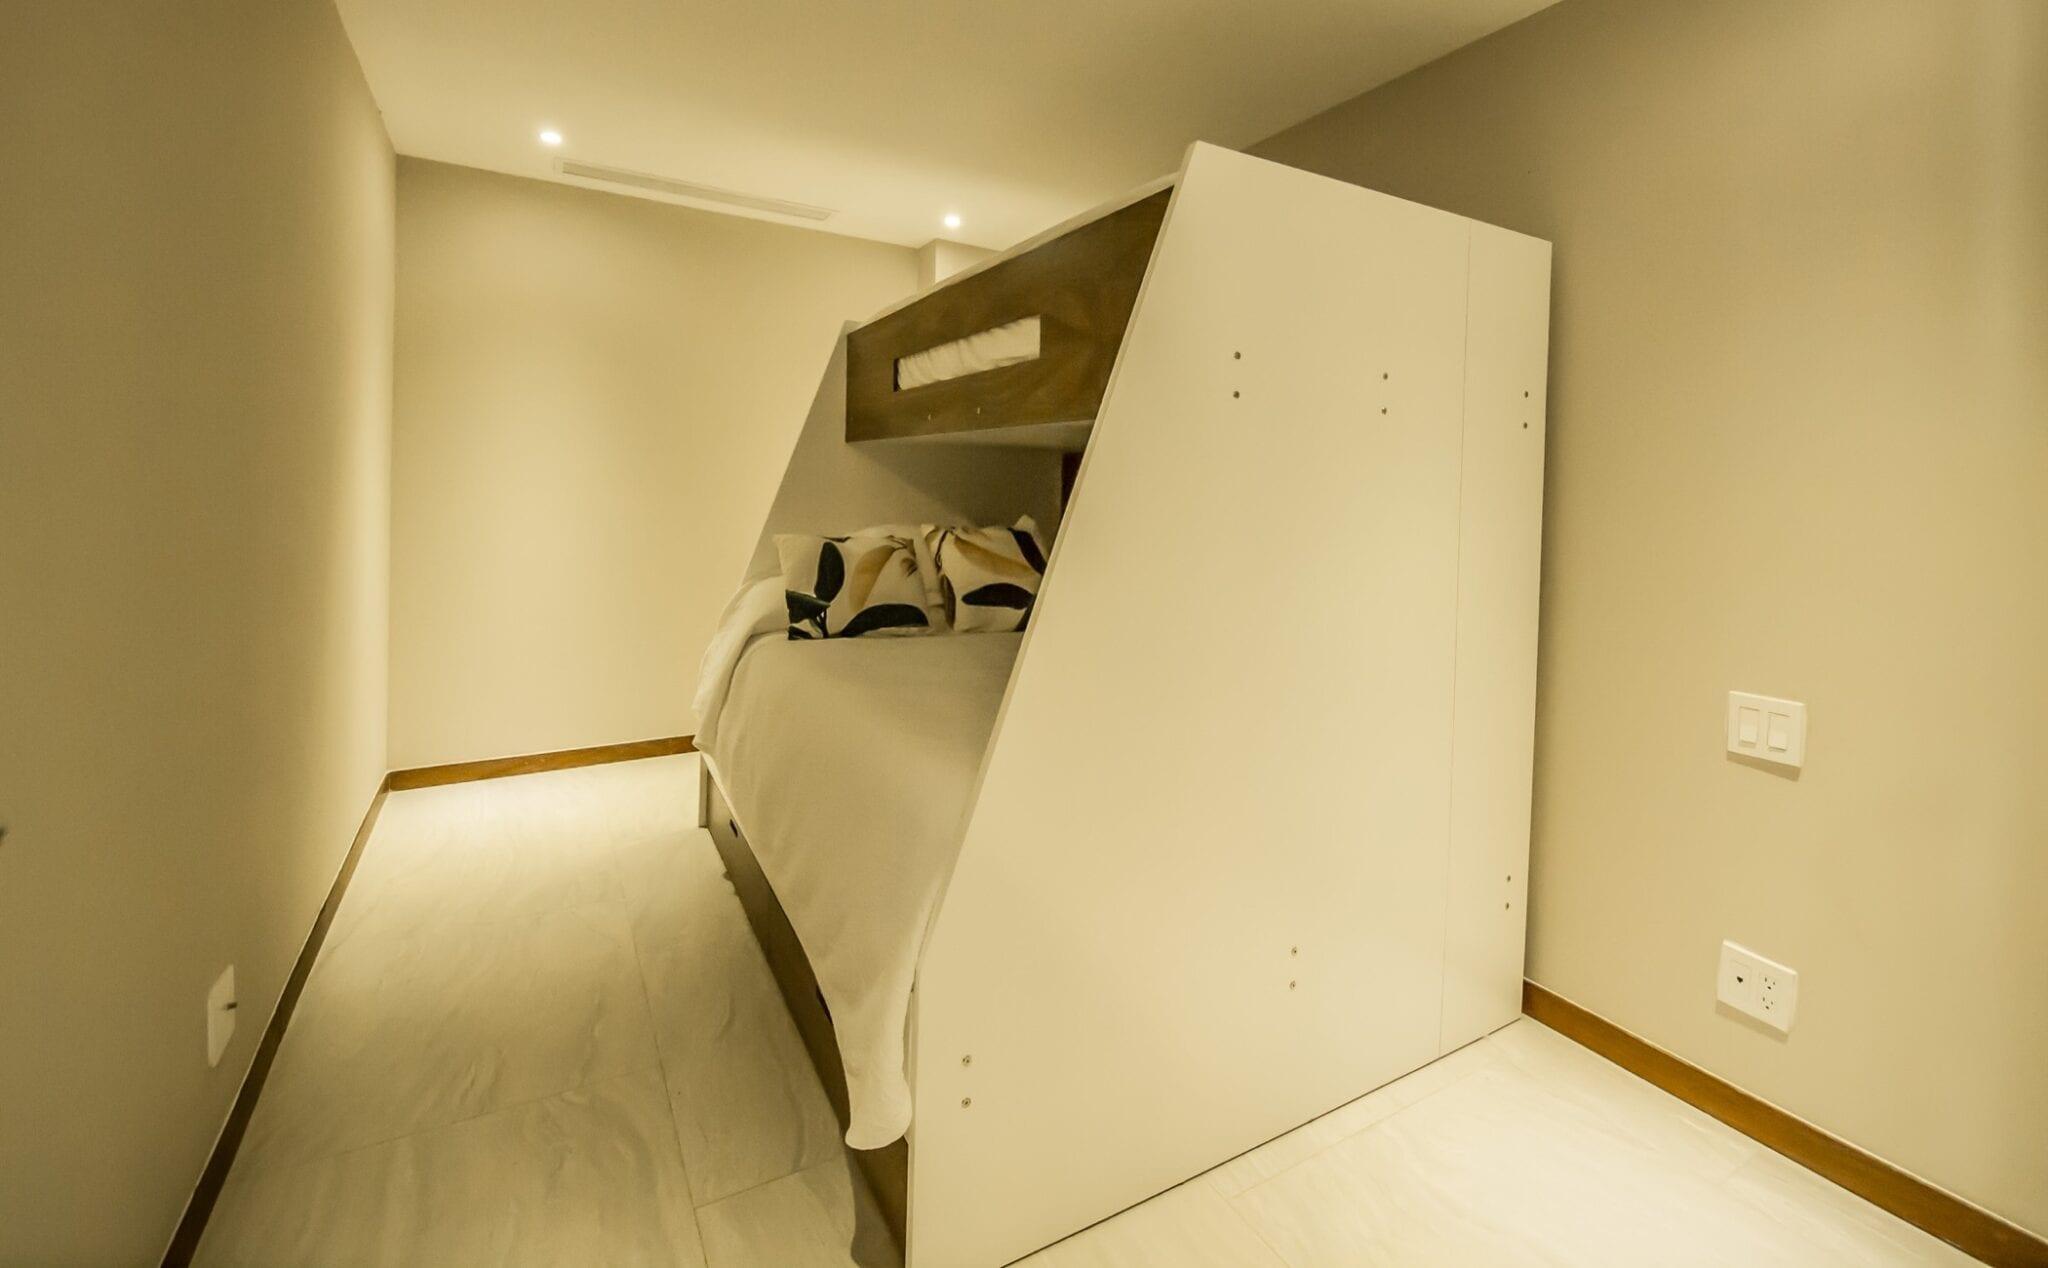 Condo Bolongo 3 Bedrooms Garden M